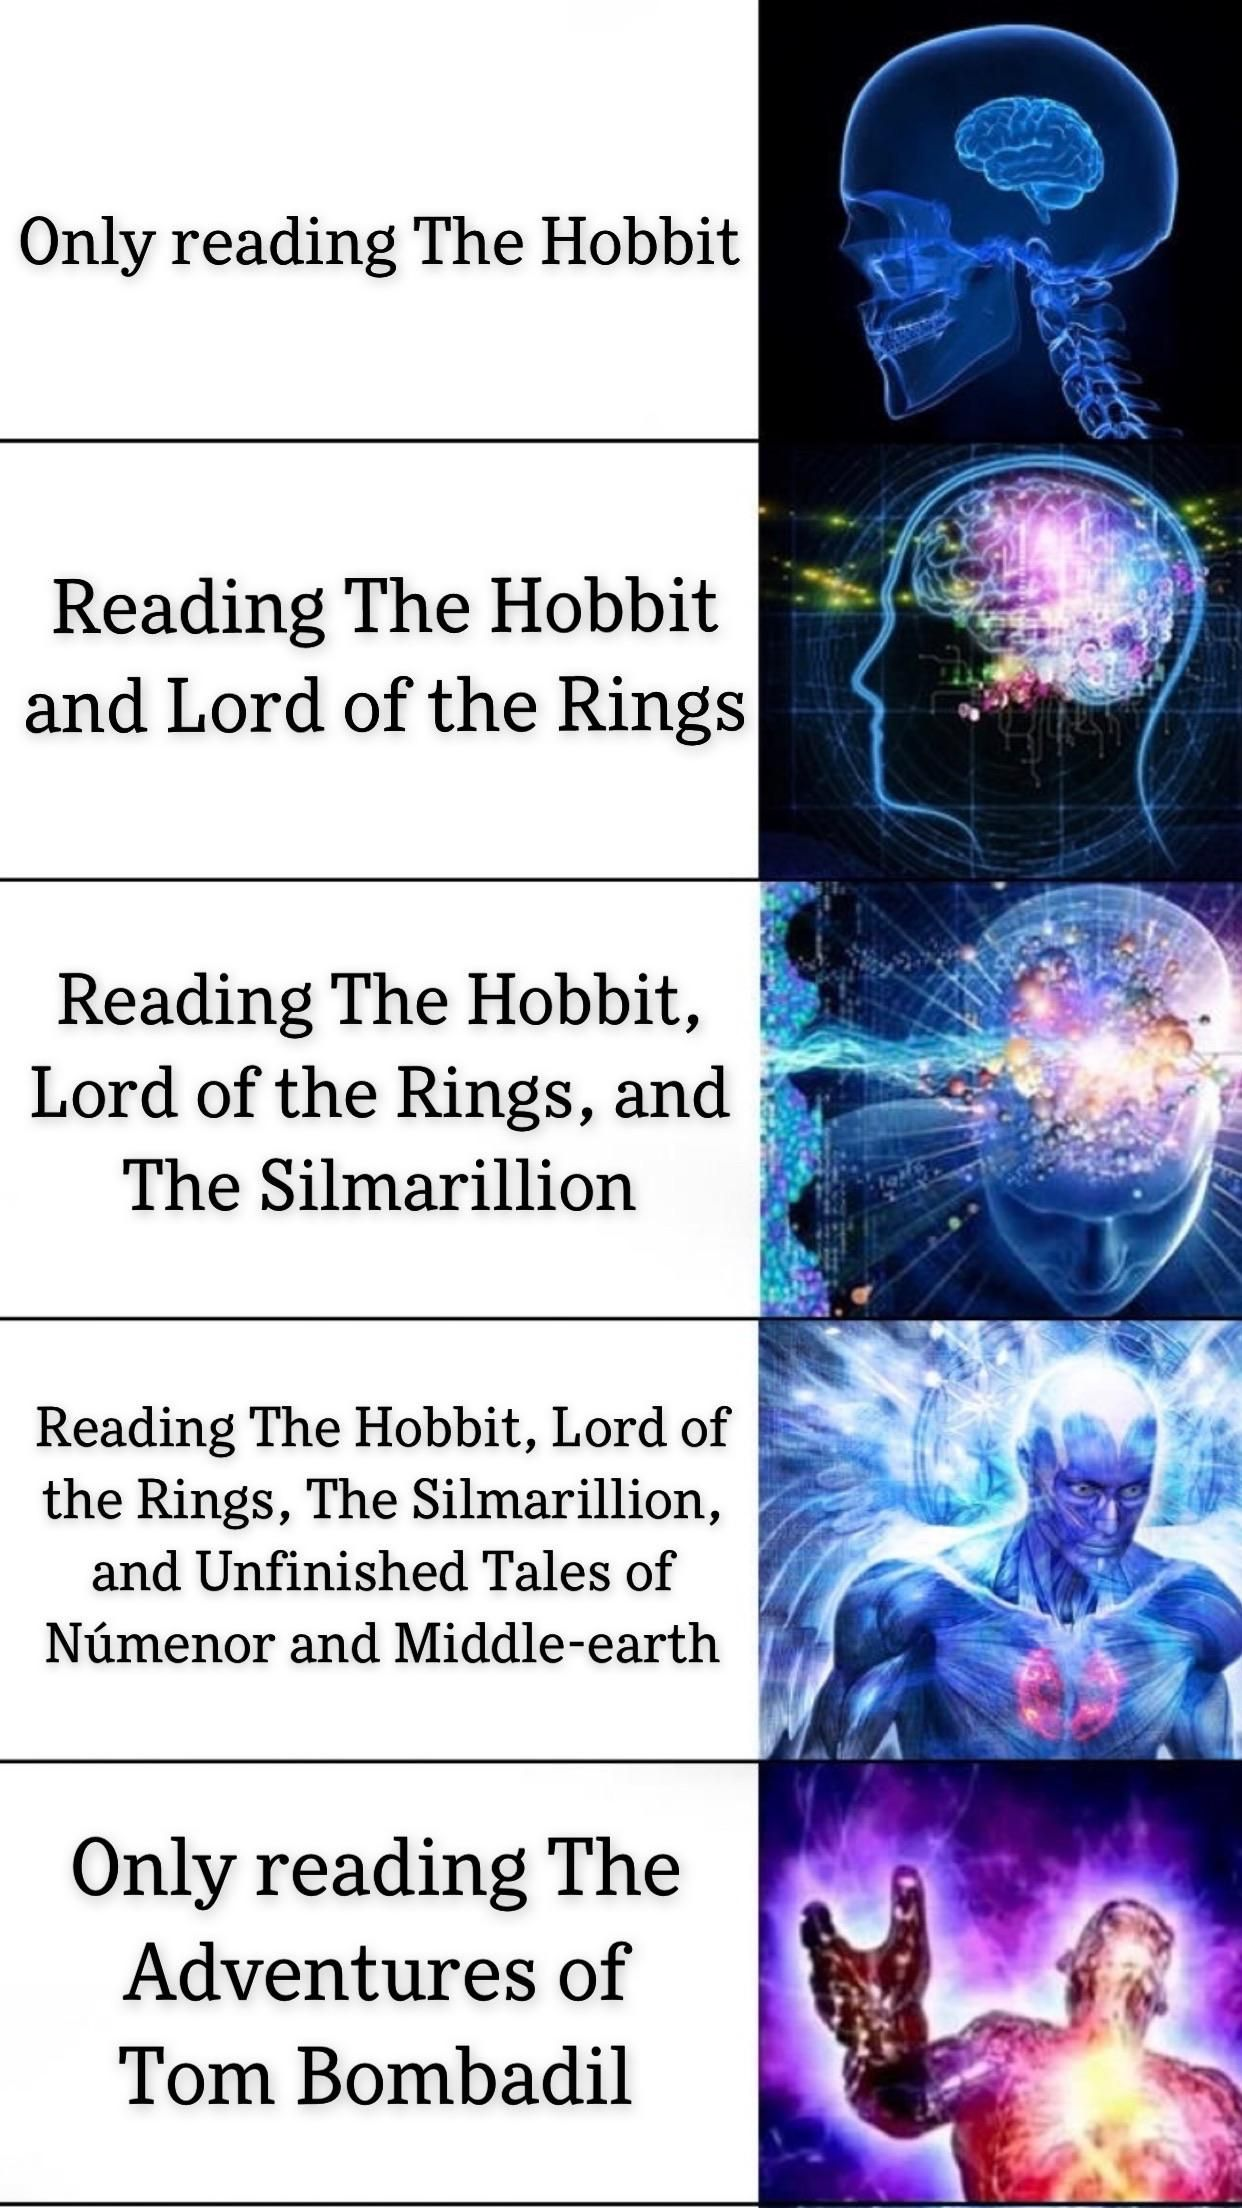 Fortnite Memes 2018 Read These Top Famous Fortnite Memes And Funny Quotes Fortnite Memes Fortnite Funny Gaming Memes Famous Memes